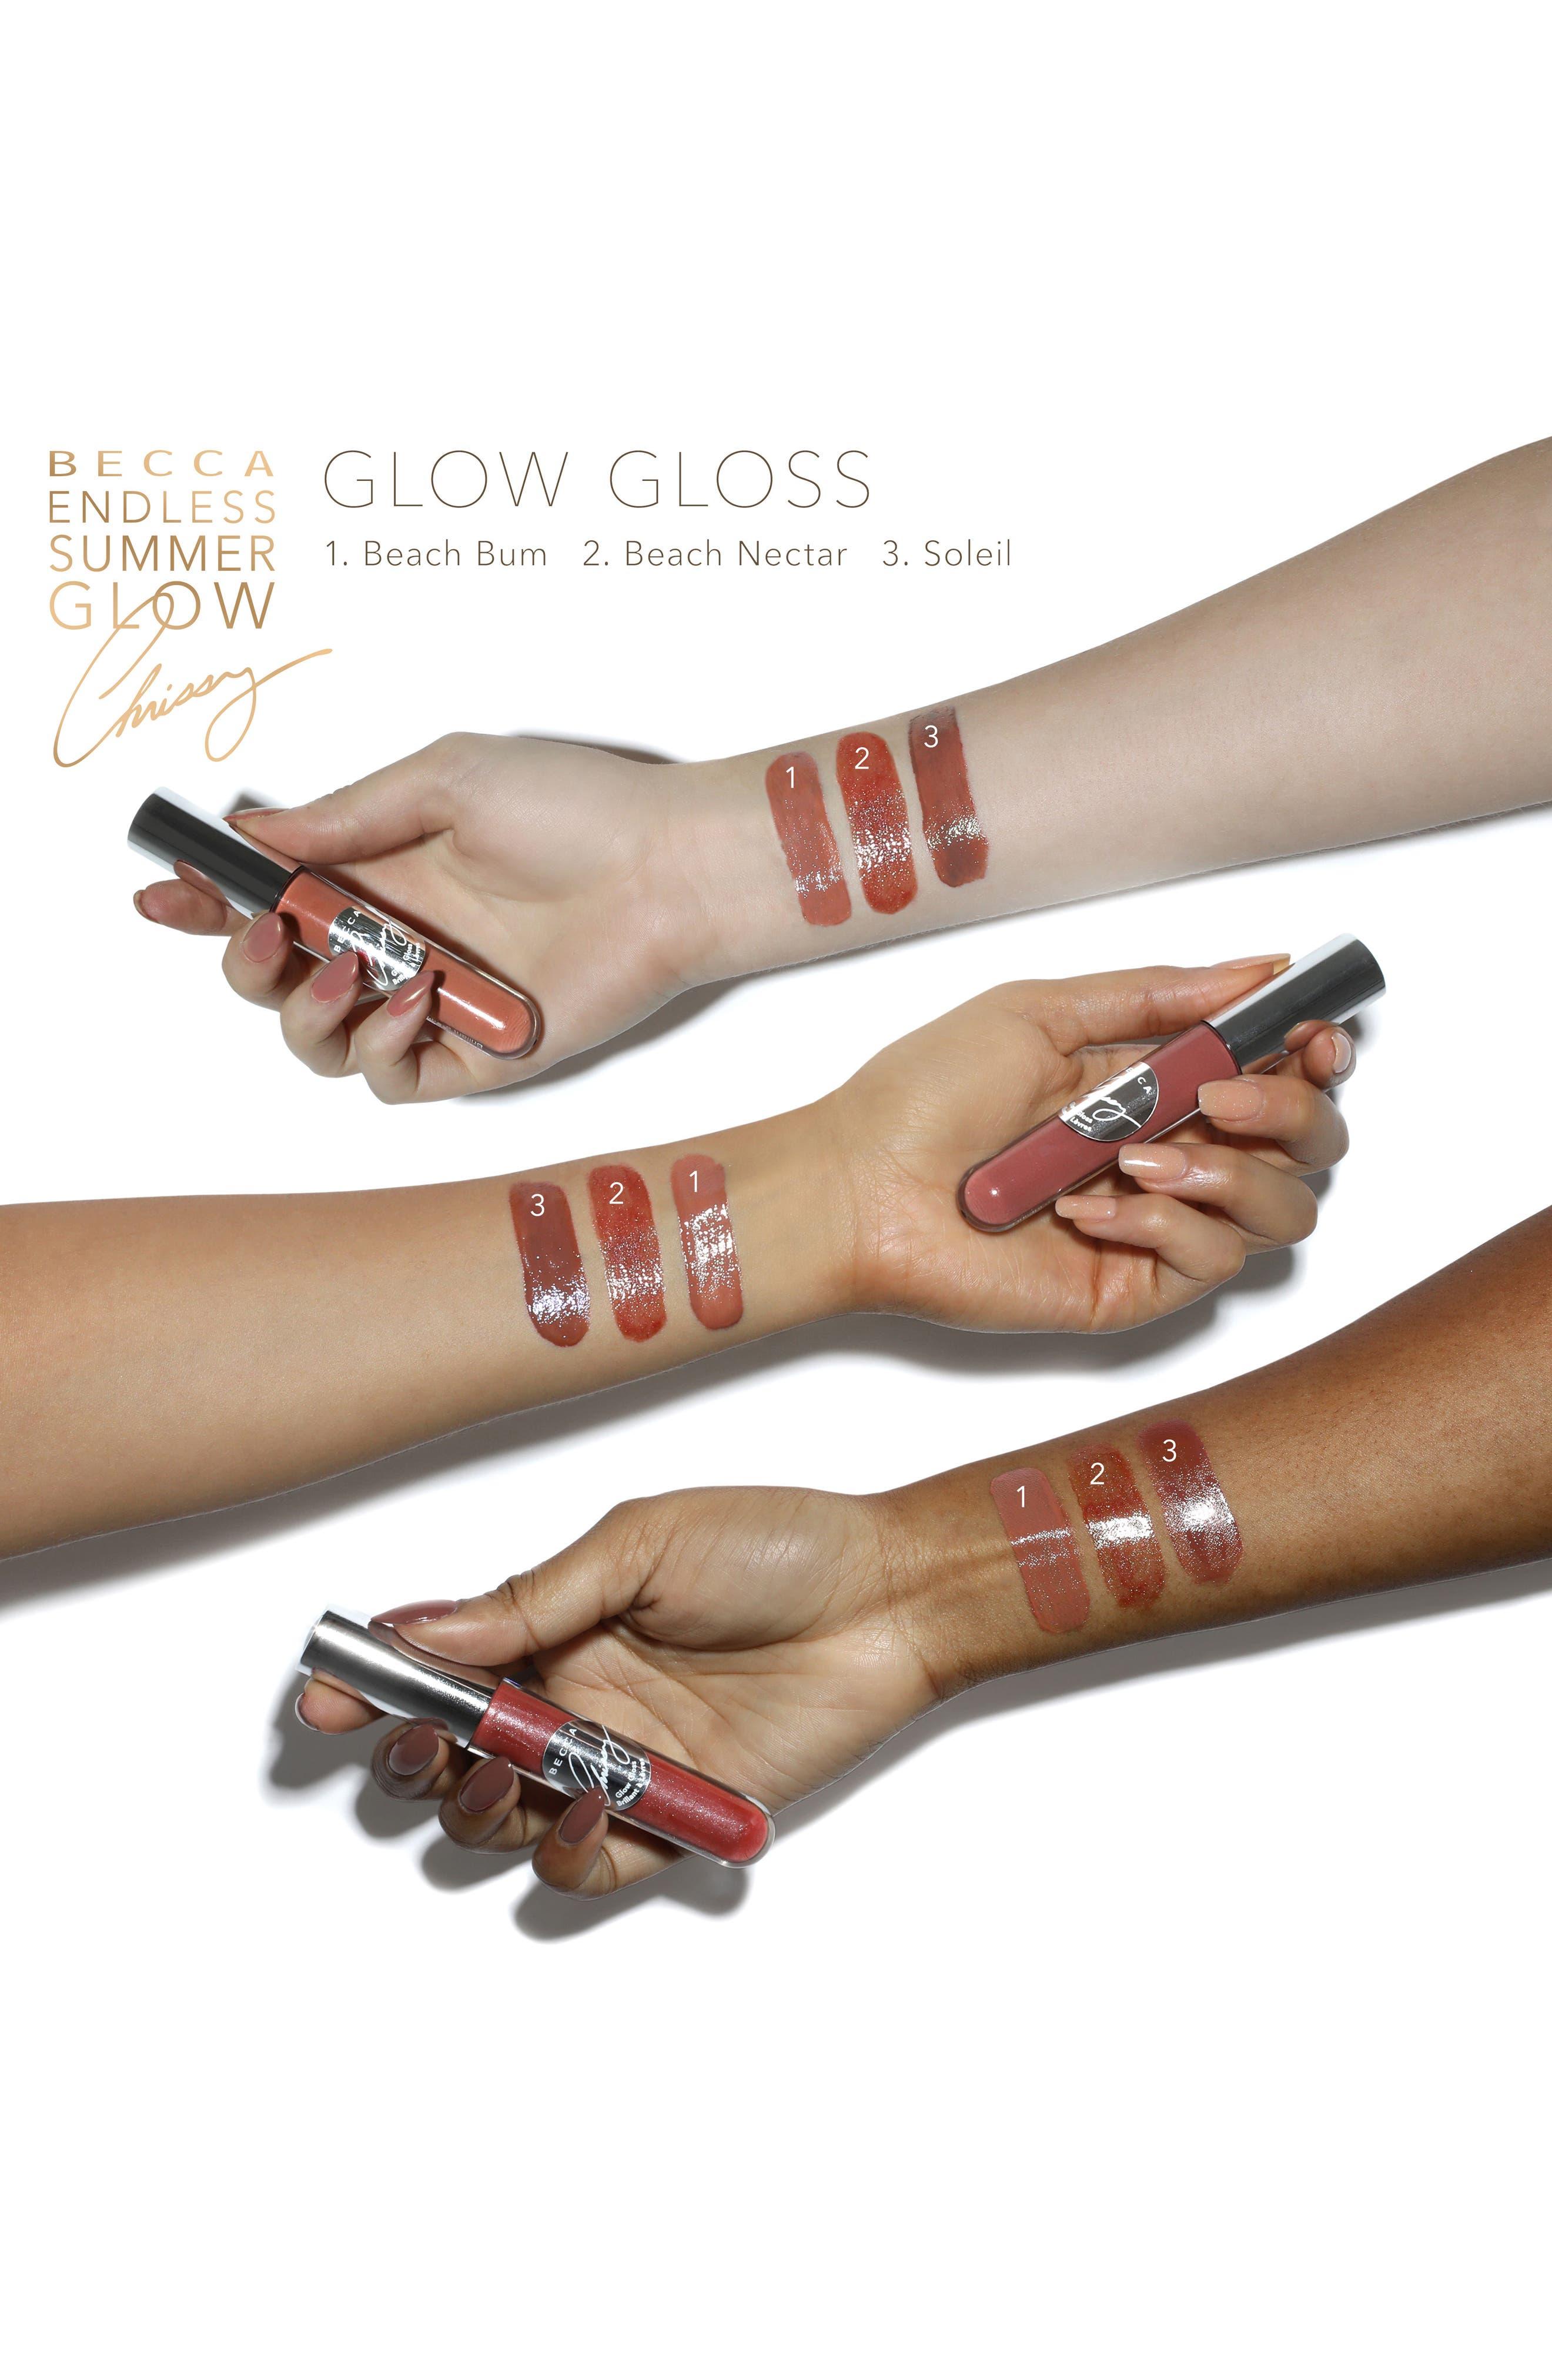 BECCA x Chrissy Teigen Glow Gloss,                             Alternate thumbnail 2, color,                             250